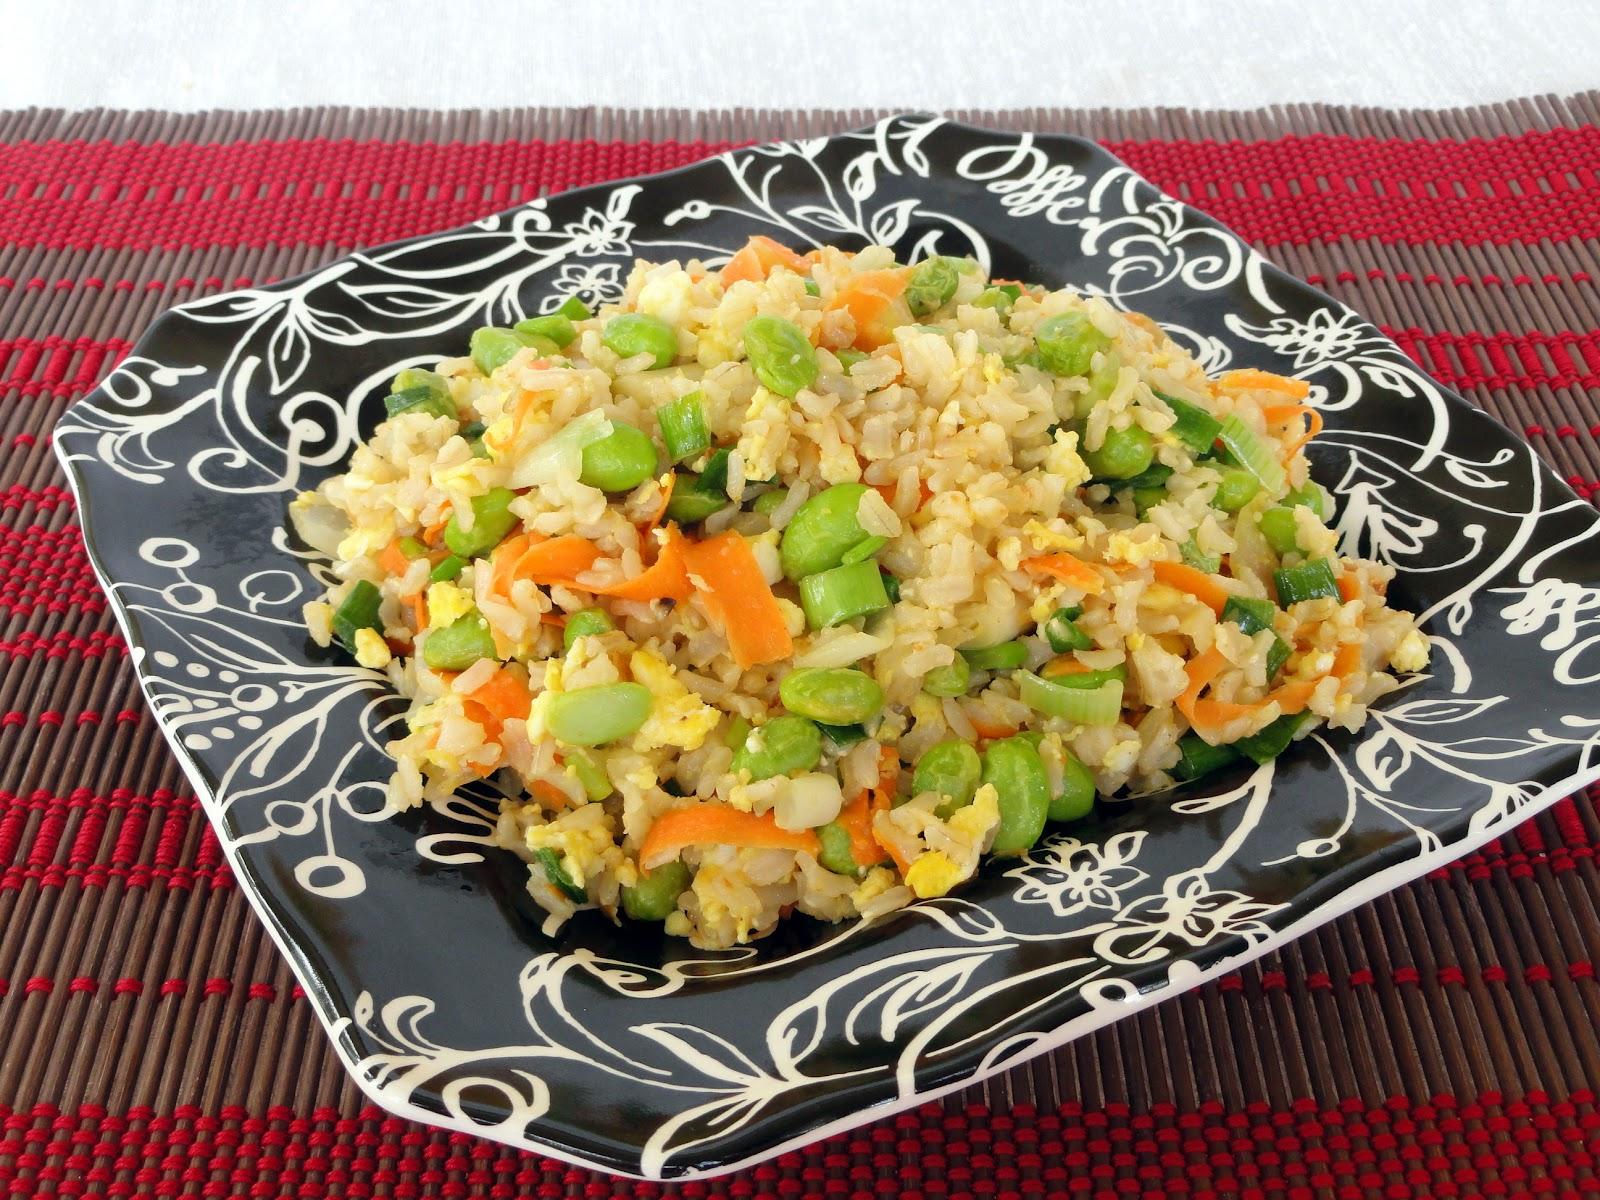 As Good As Gluten: April 2012